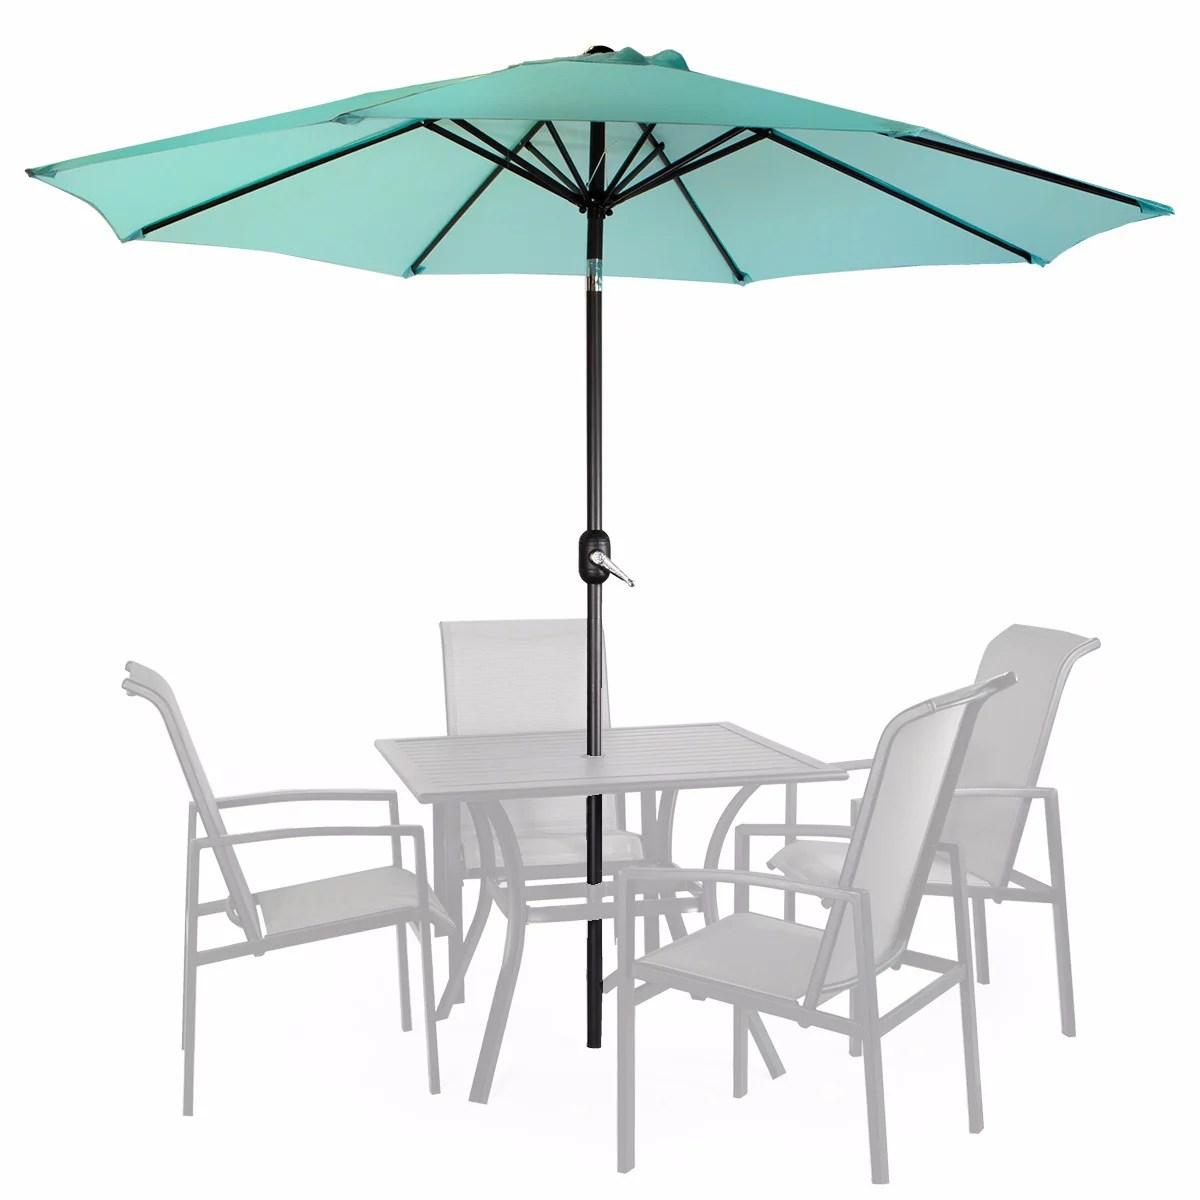 mainstays 9 outdoor market umbrella turquoise